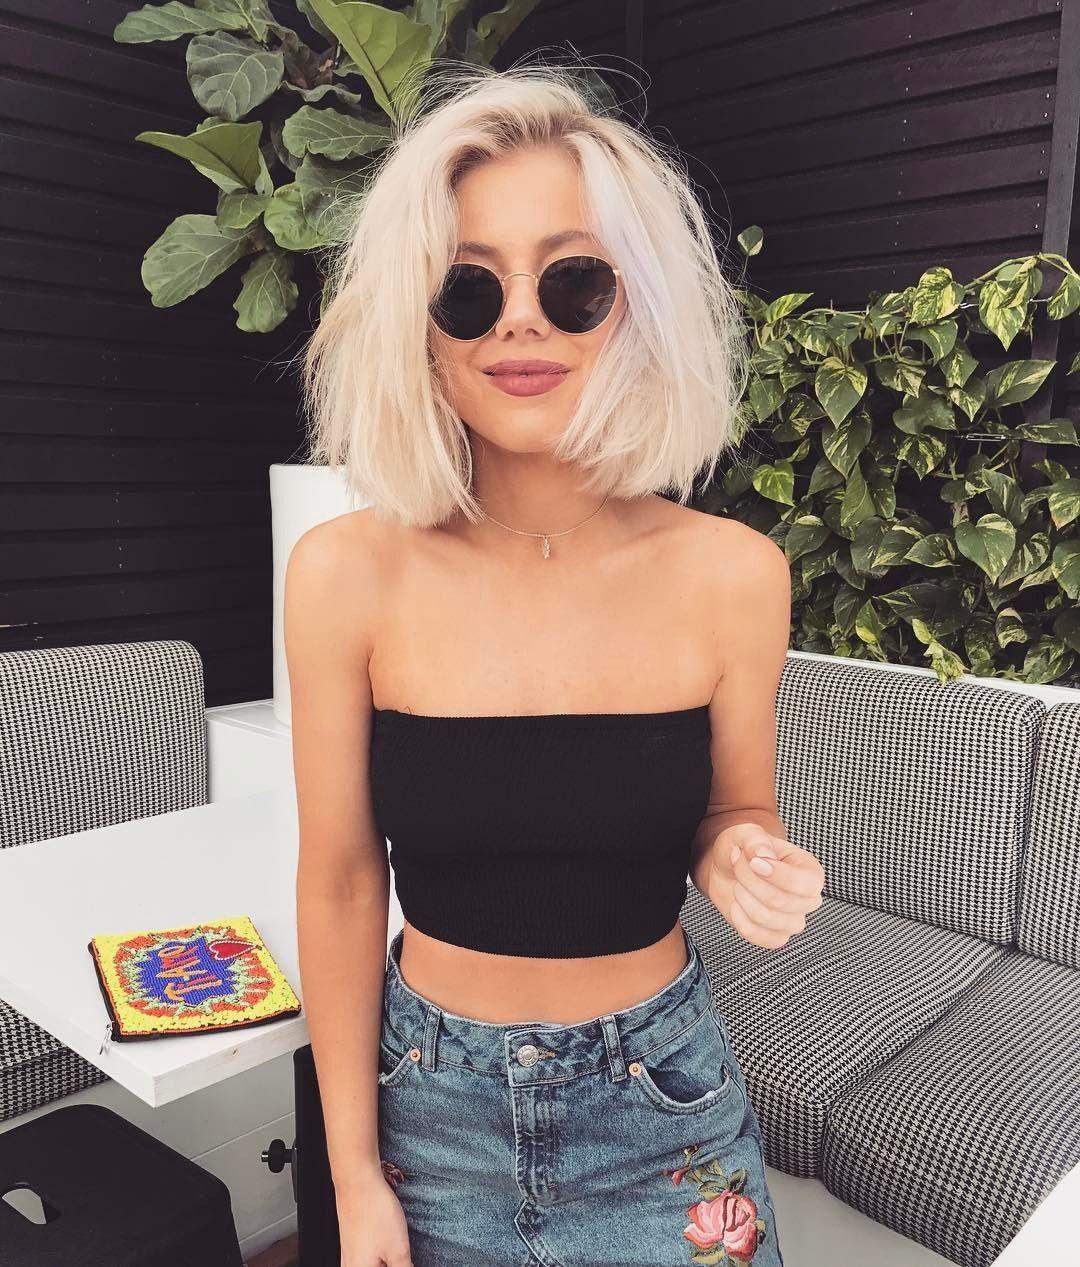 laura jade stone (@laurajadestone) • instagram-fotos und -videos